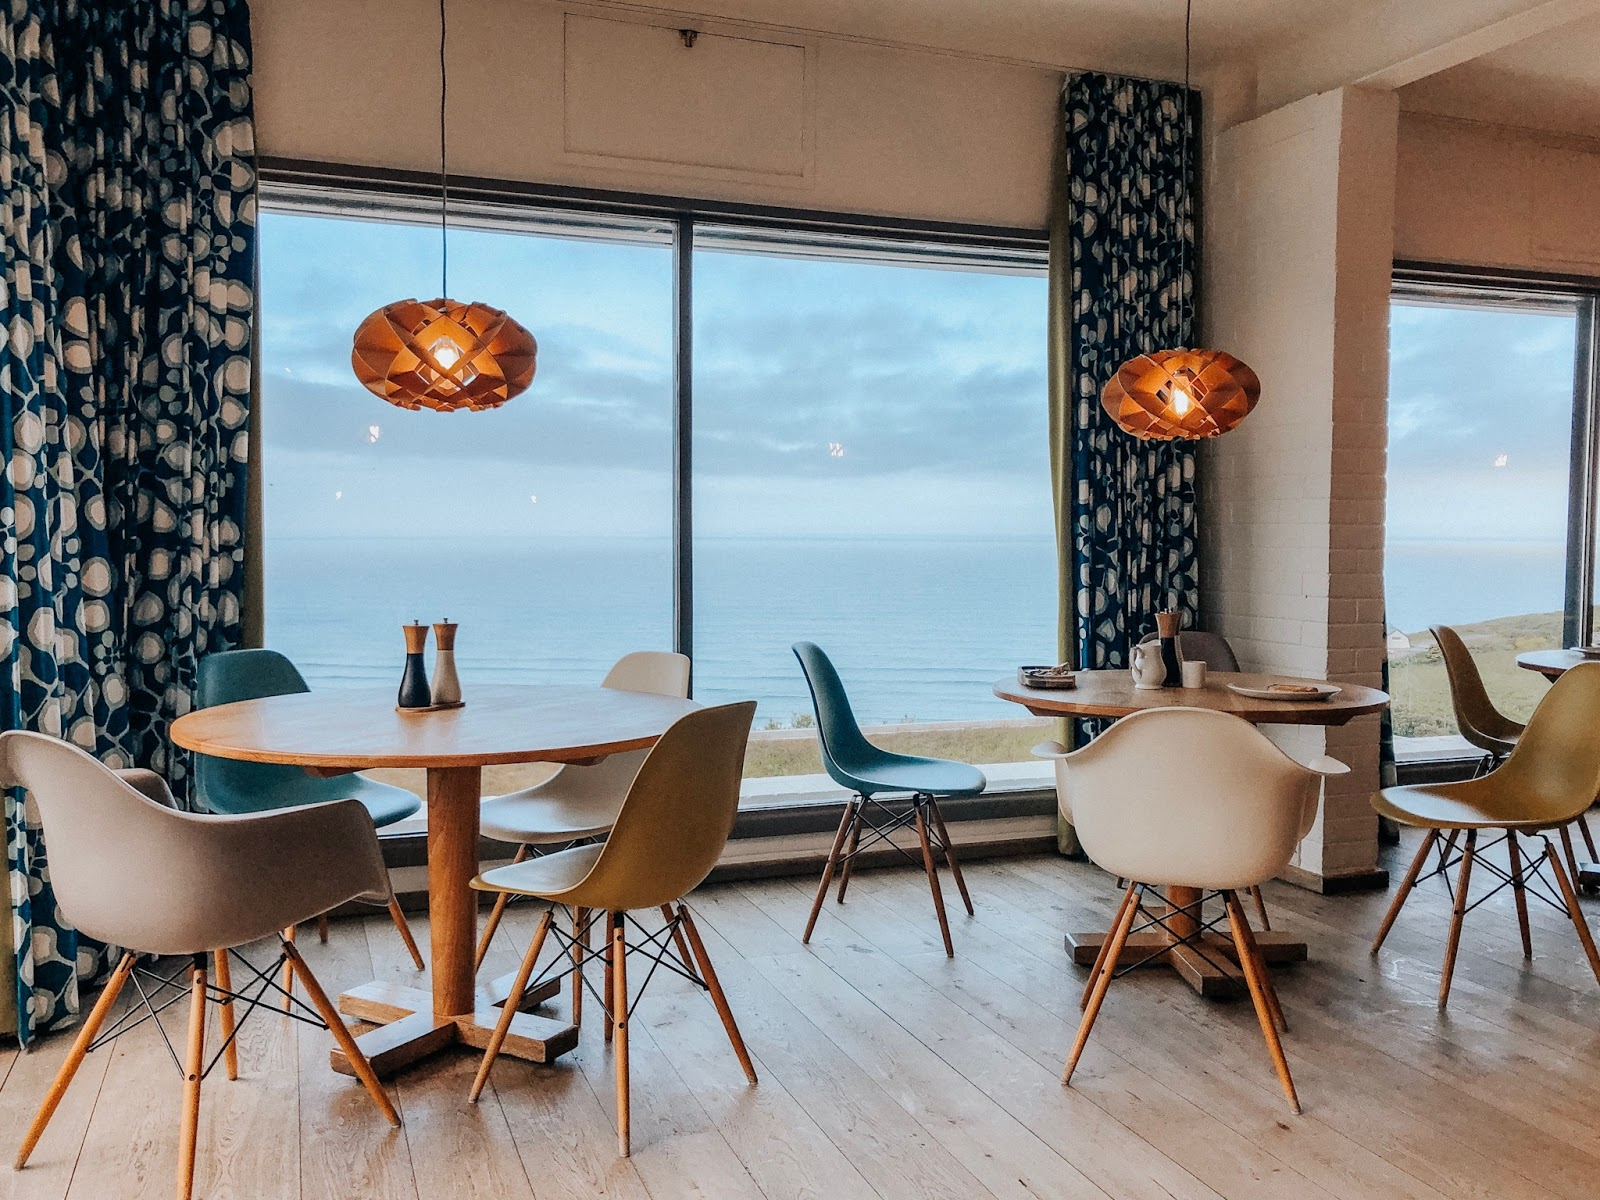 Mawgan Porth Beach, Cornwall Holidays, bedruthan Hotel & Spa, luxury stay cornwall, family holidays cornwall , wild cafe bedruthan hotel